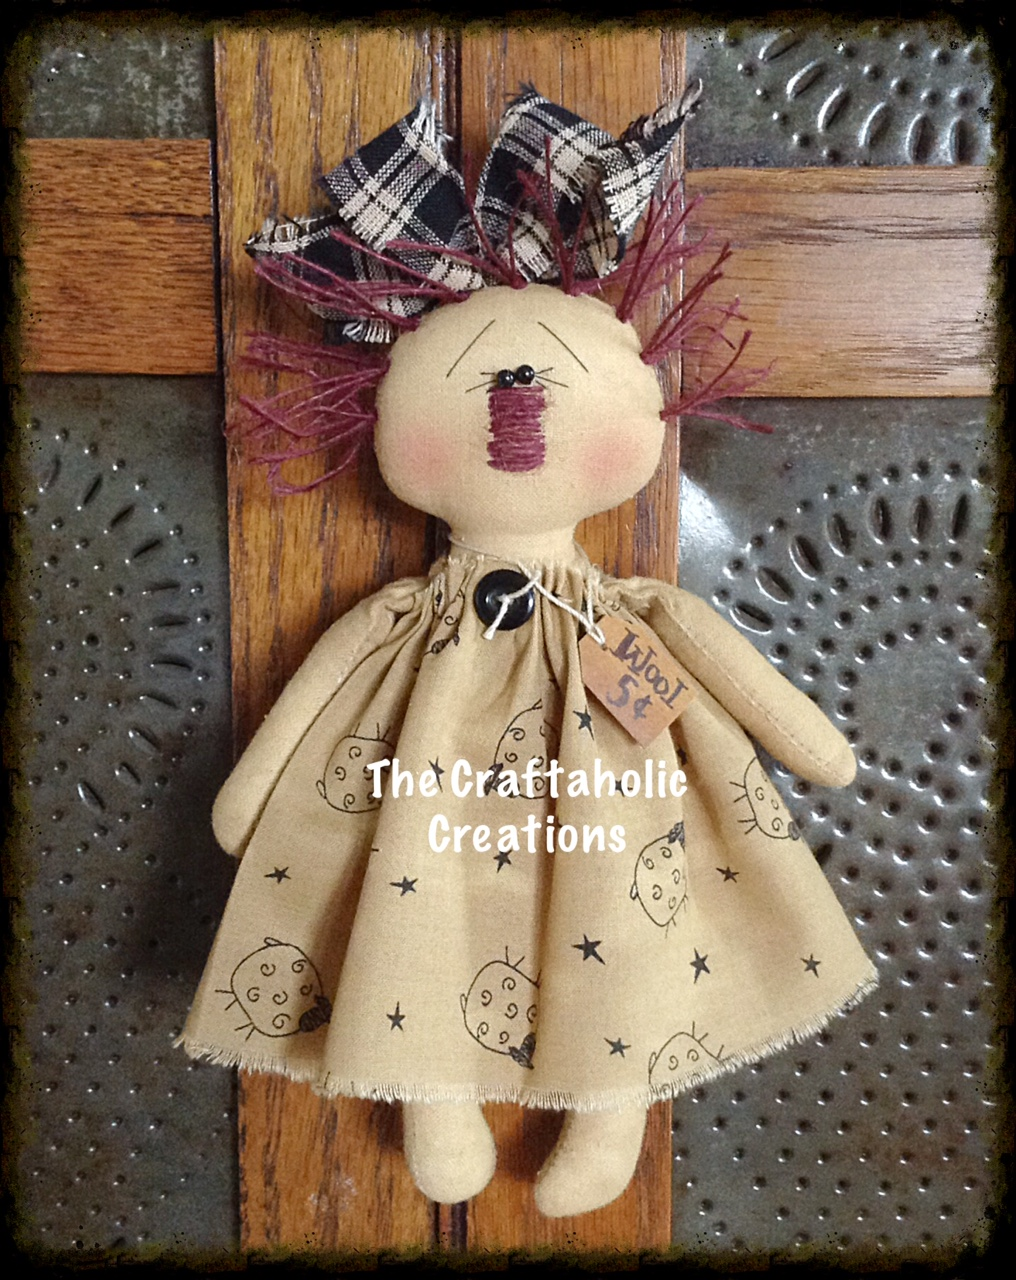 the craftaholic creations